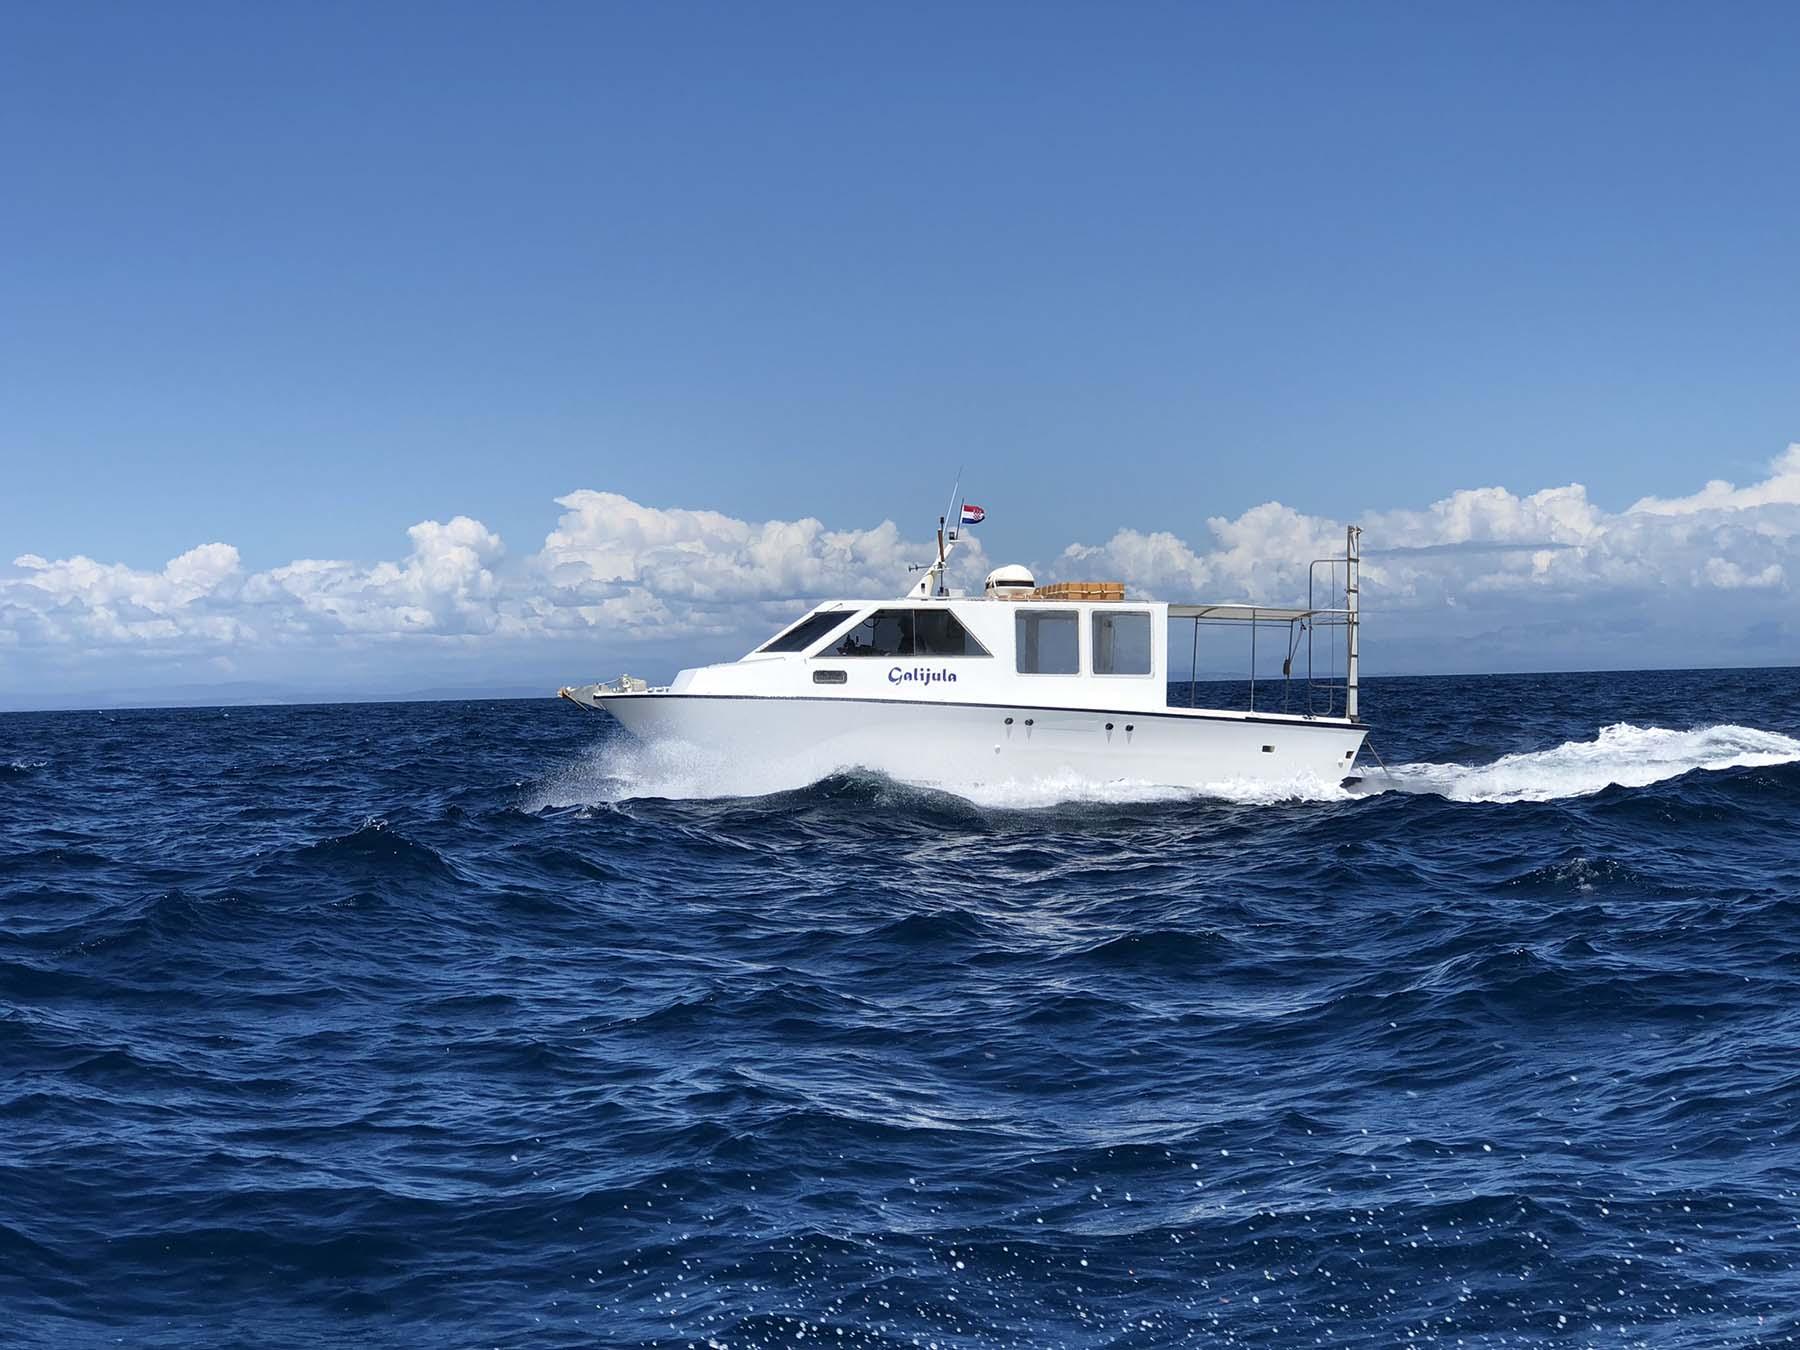 Galijula boat